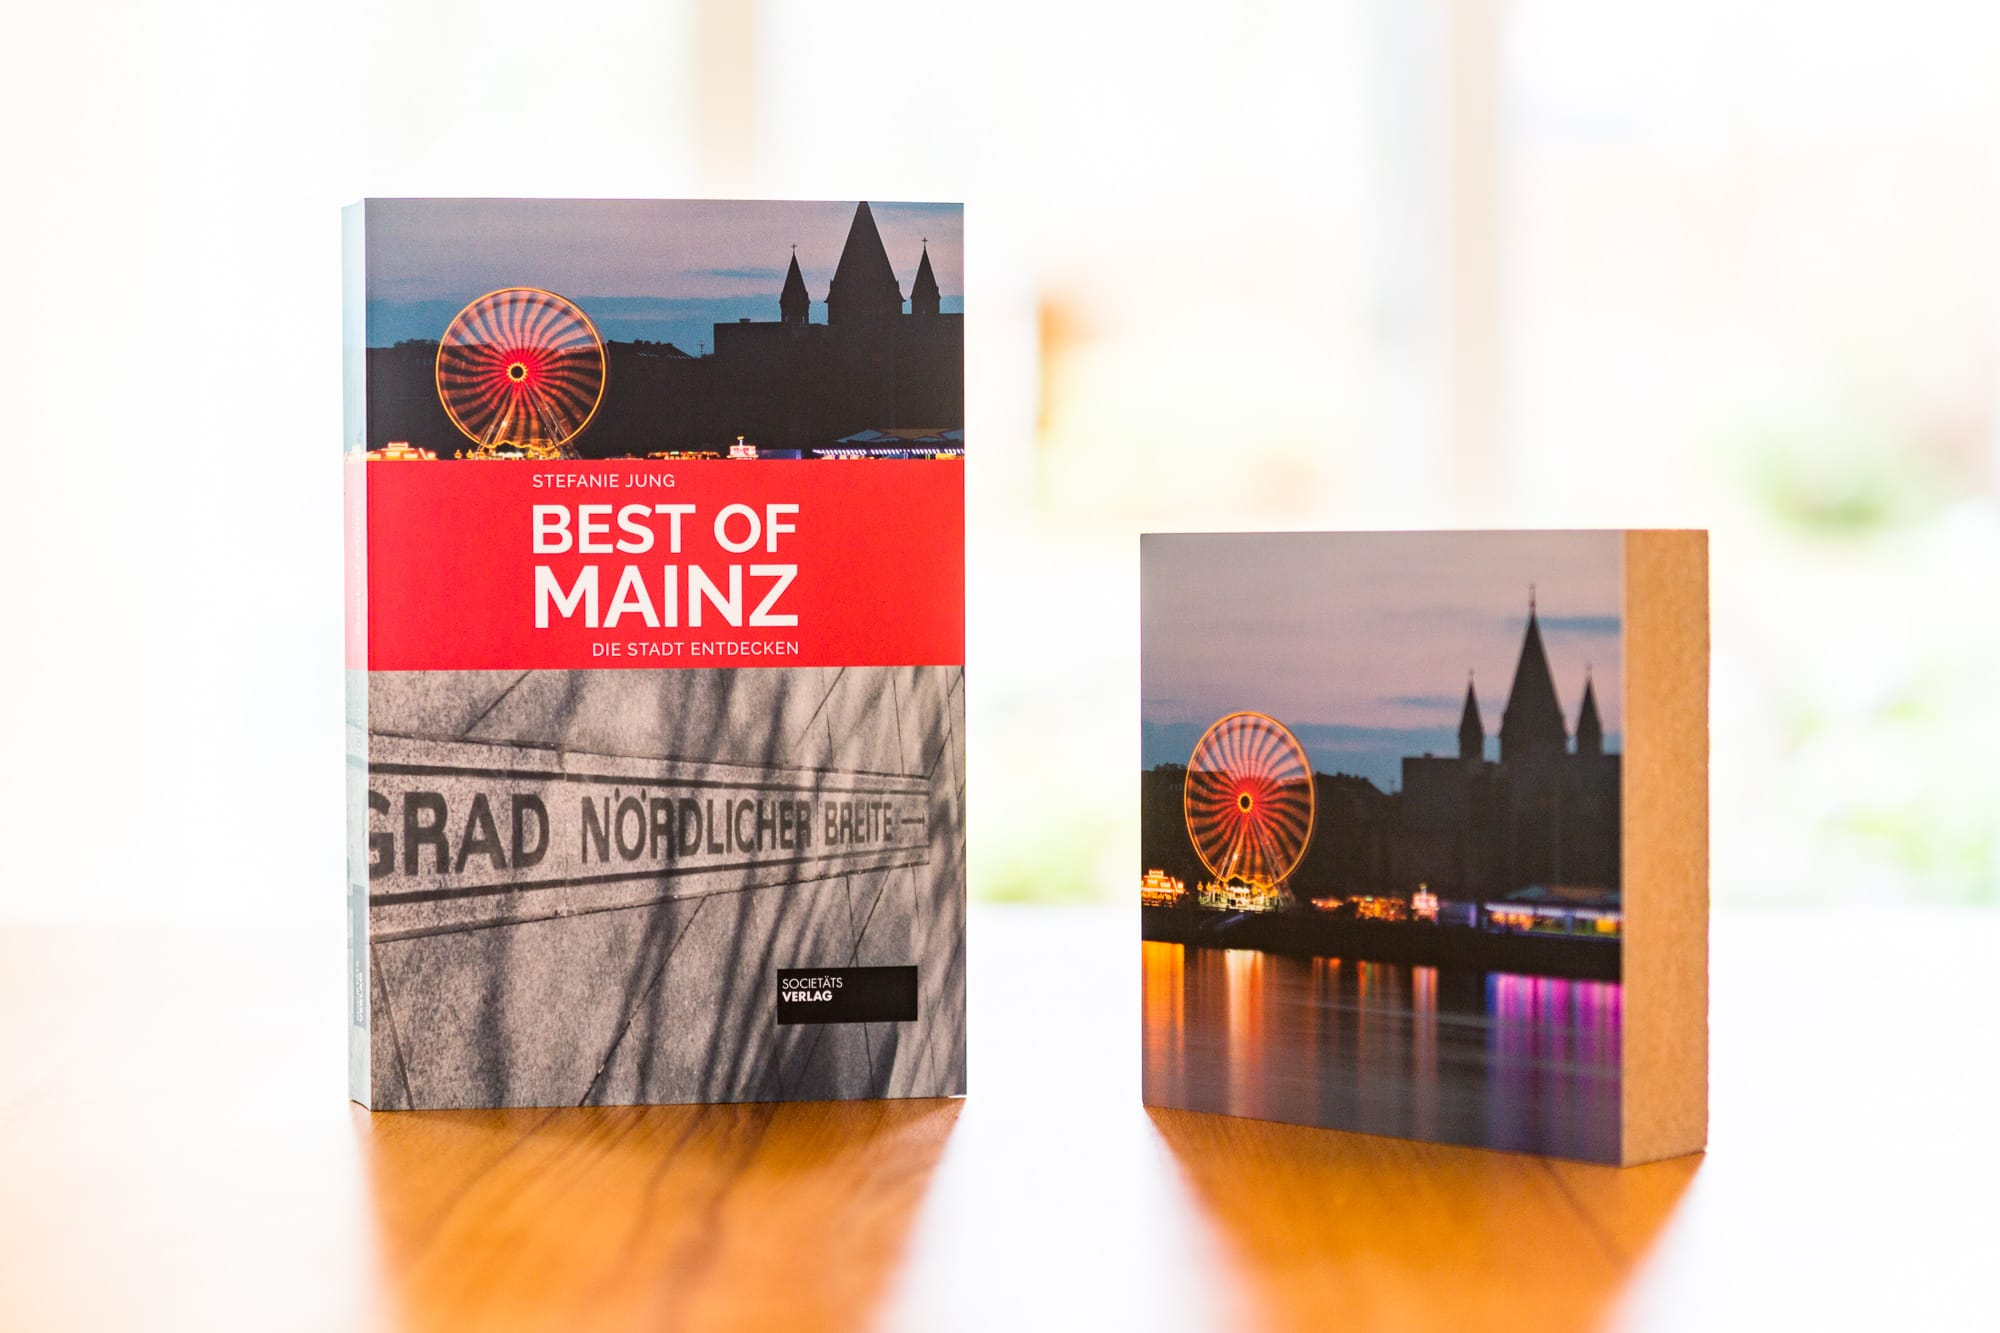 querformat-fotografie - Achim Katzberg - Best of Mainz trifft Mainz im Quadrat